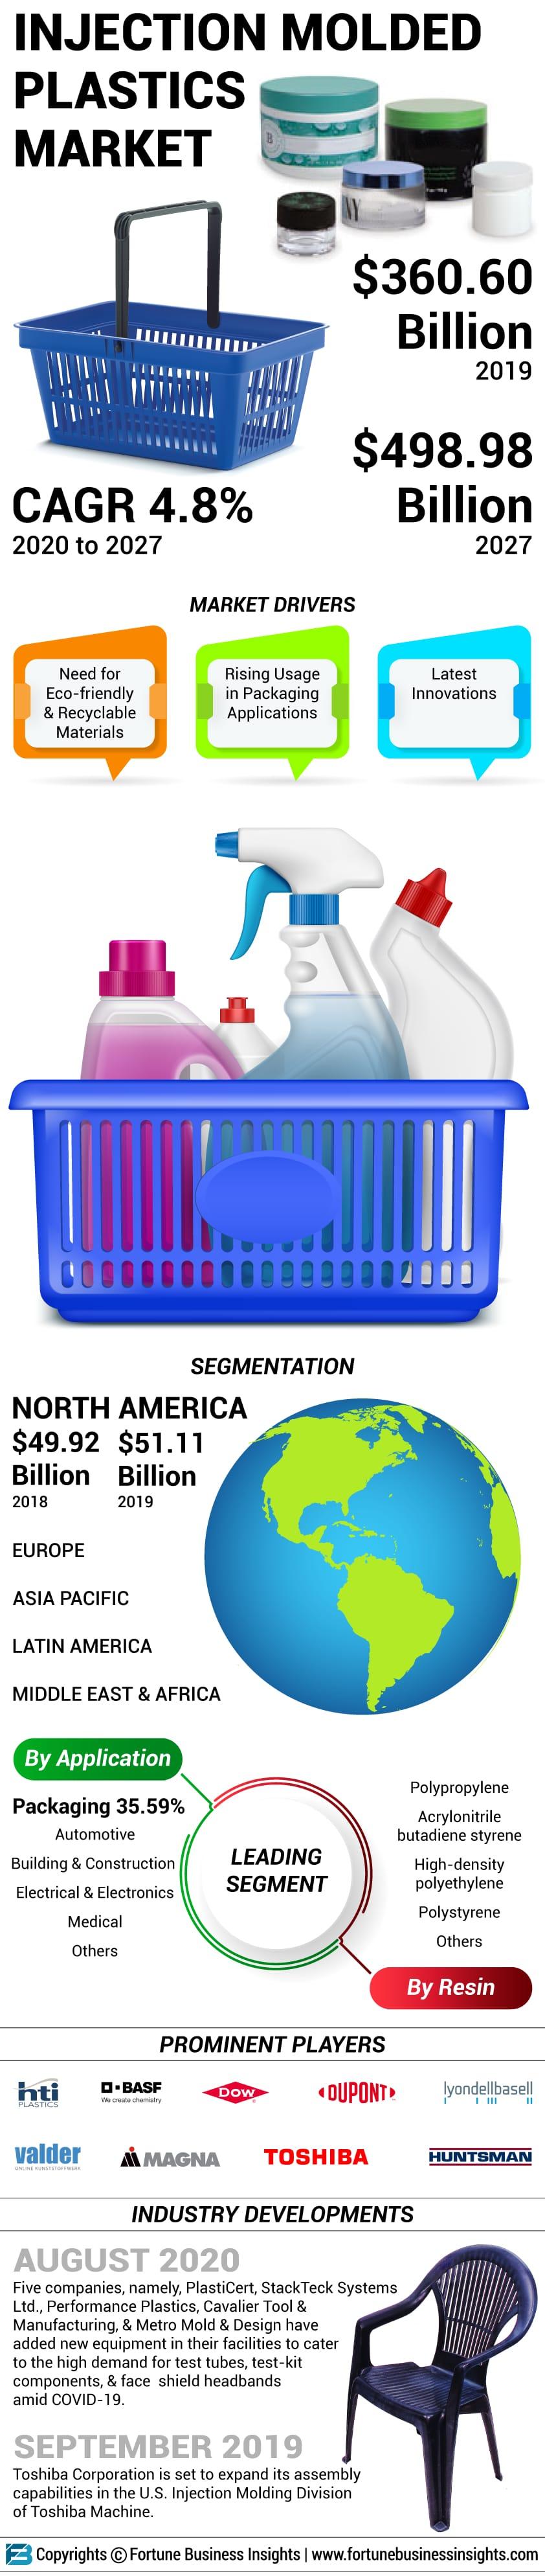 Injection Molded Plastics Market